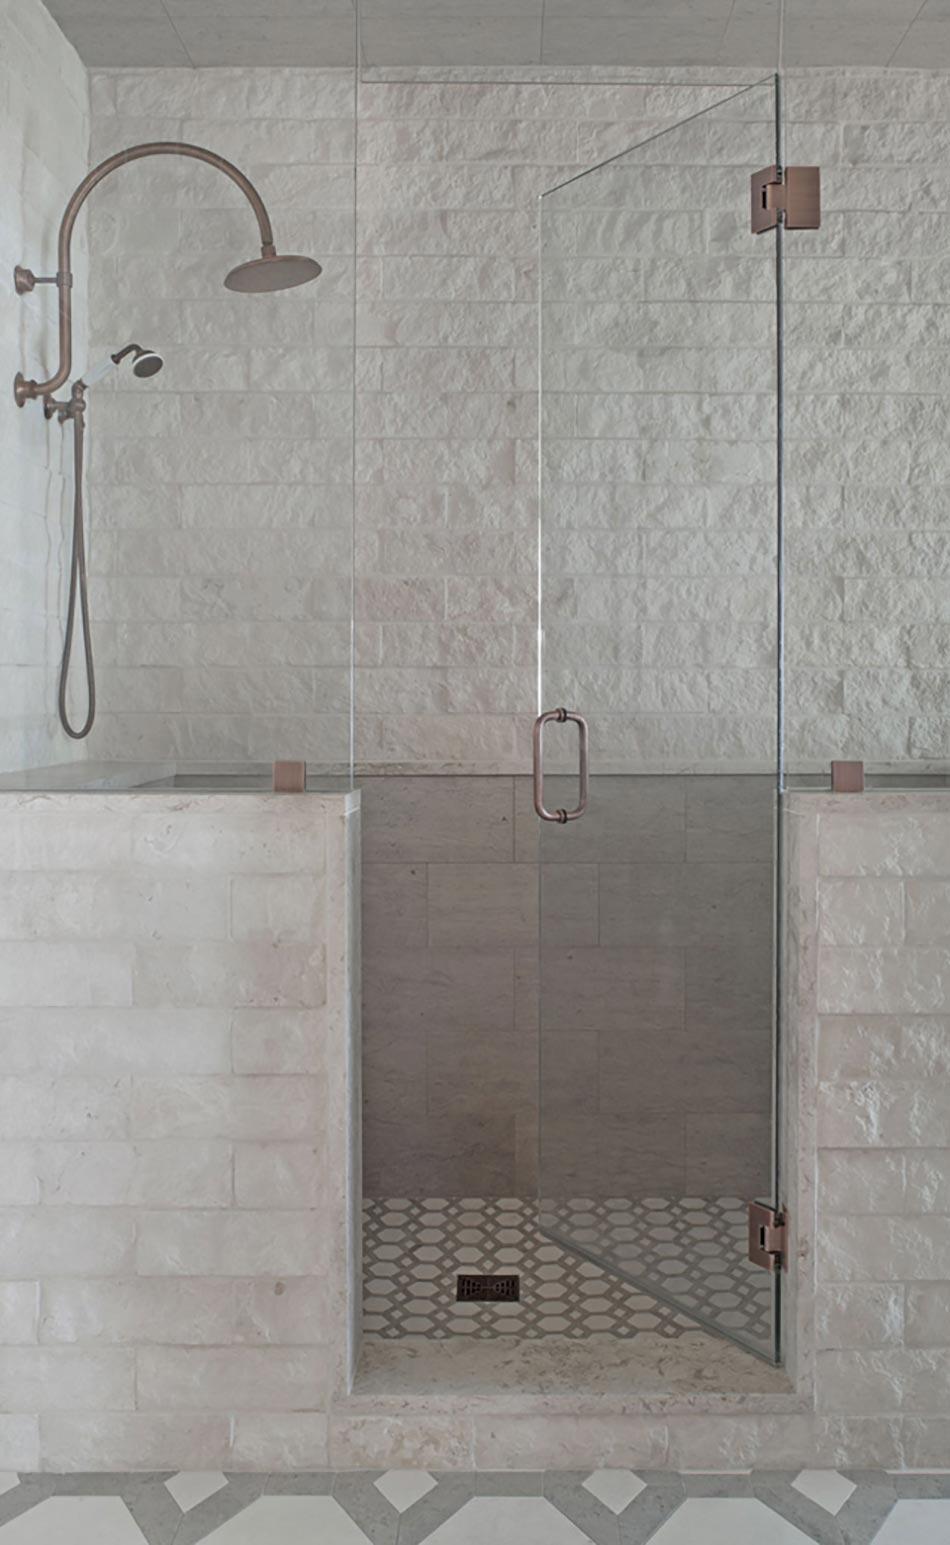 Salle de bain design au style intemporel design feria - Salle de bain moderne douche italienne ...